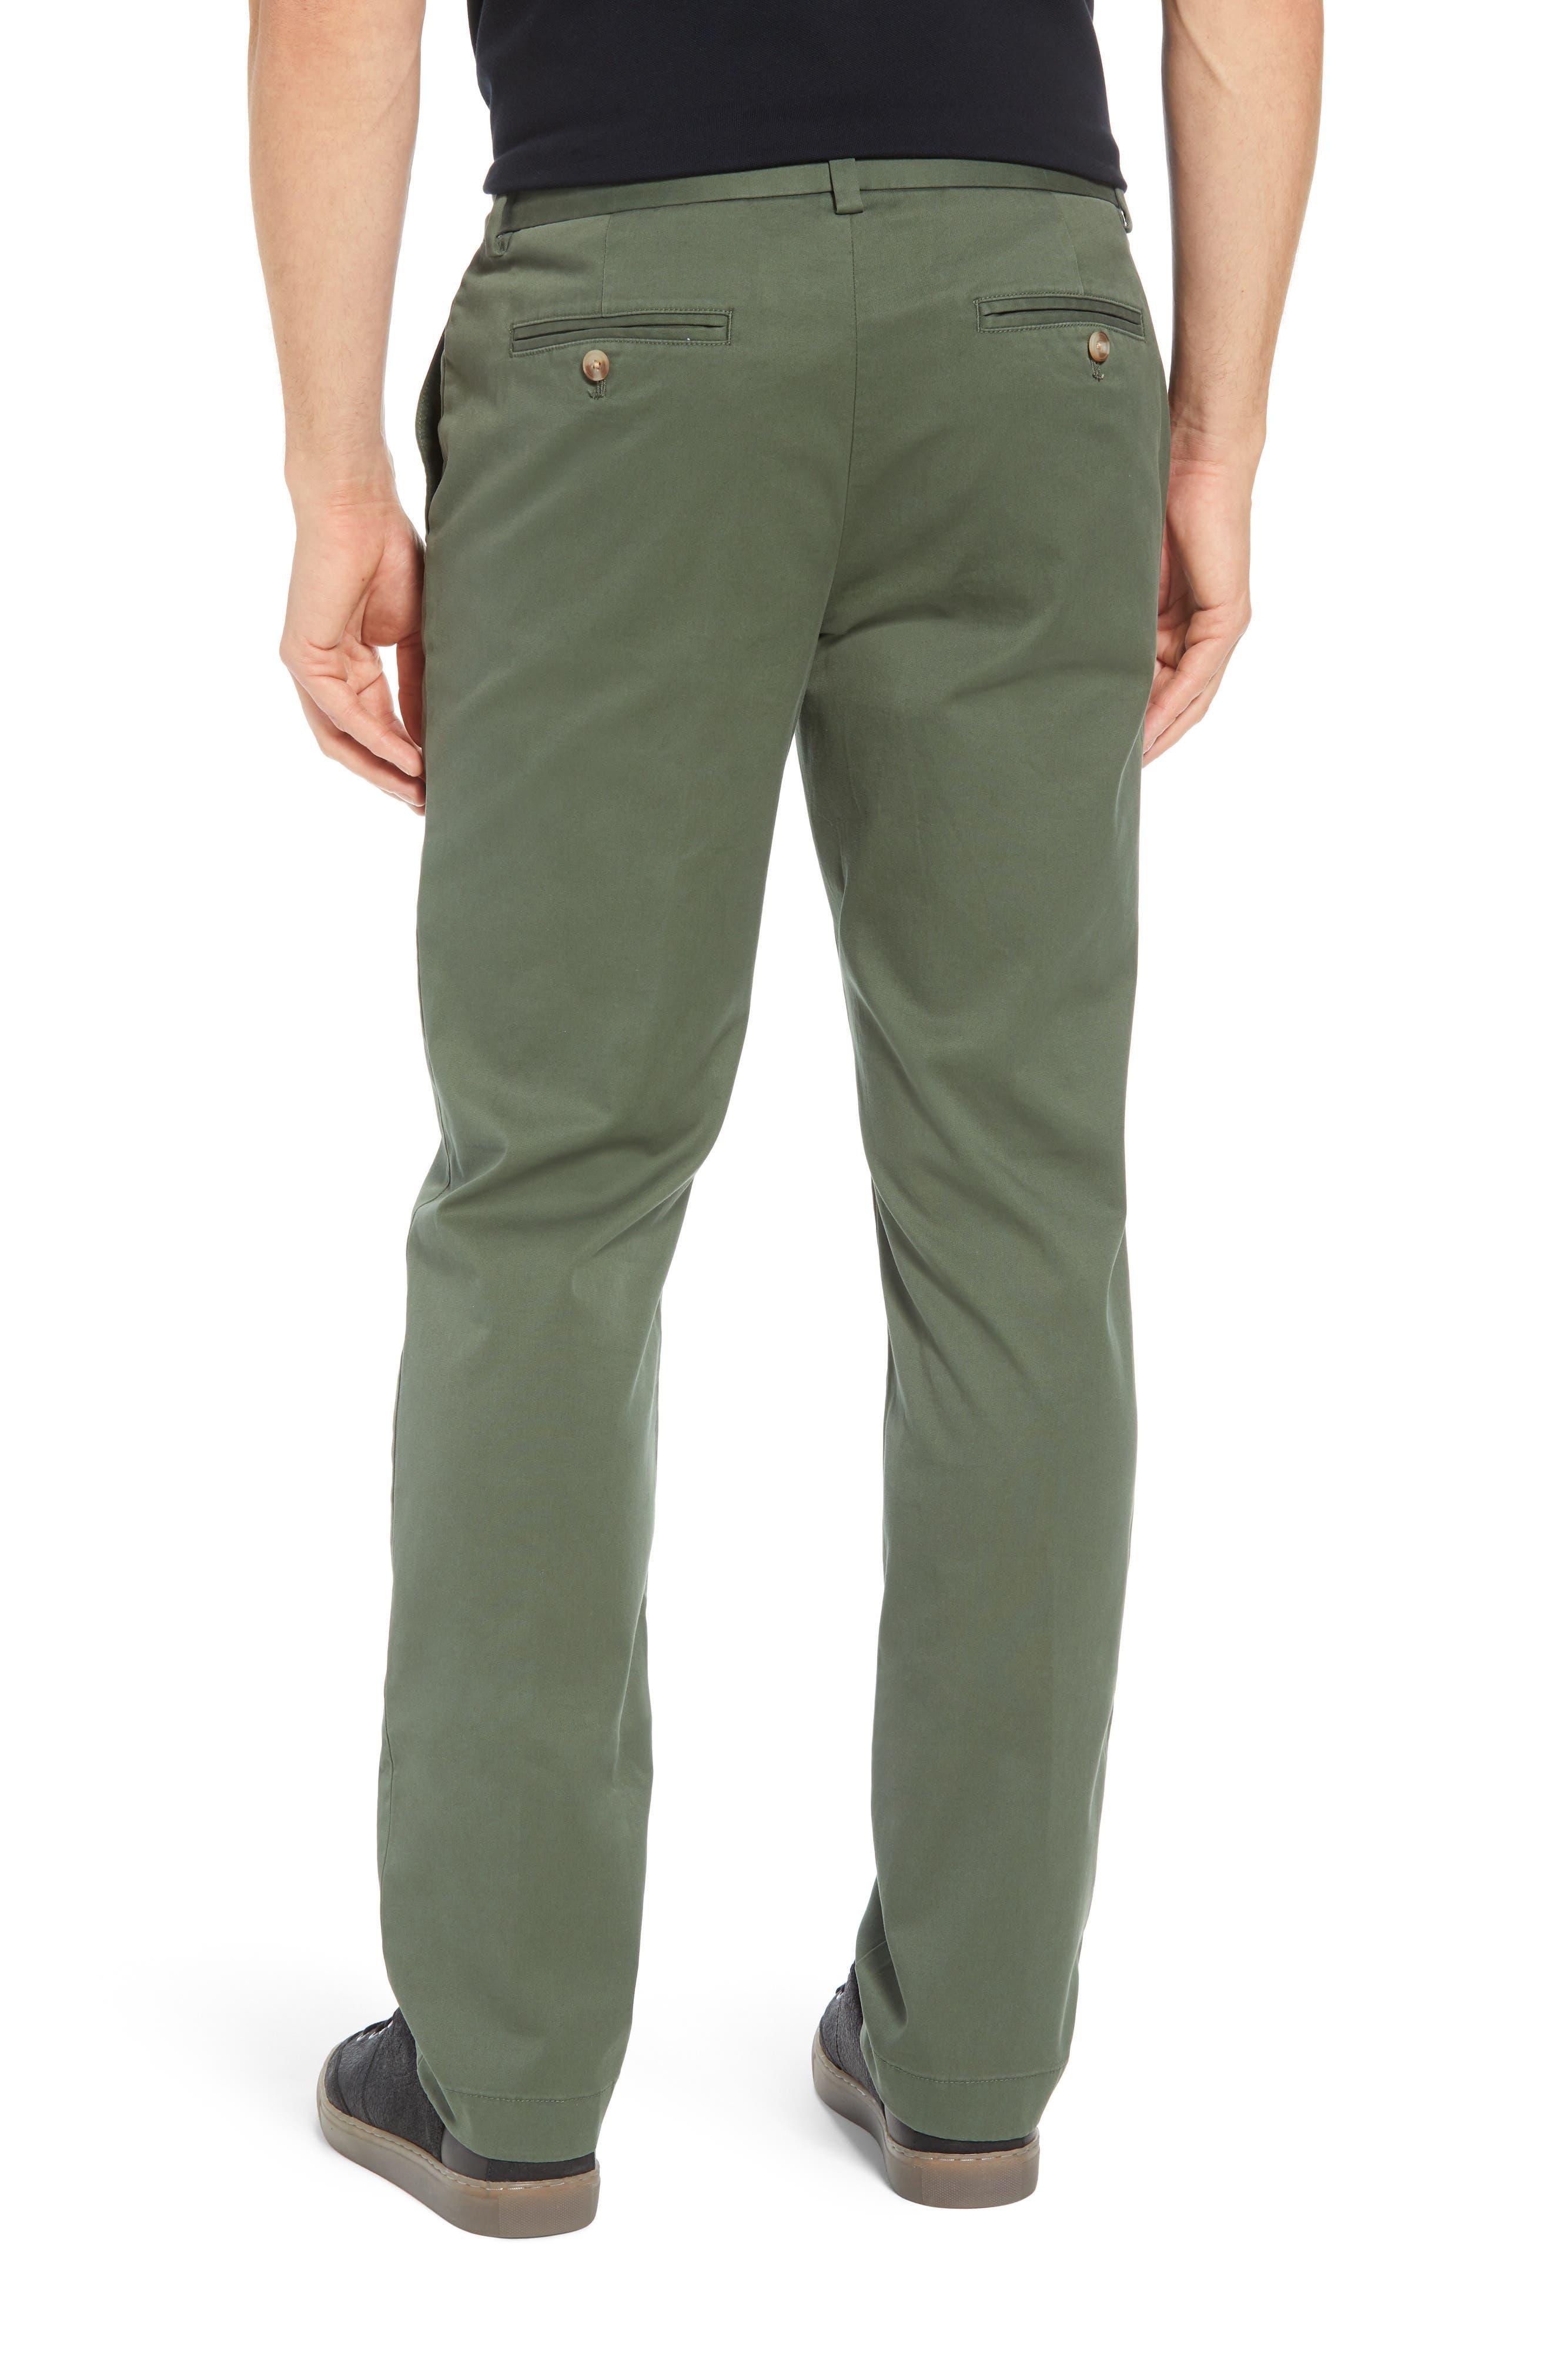 VINEYARD VINES, Breaker Flat Front Stretch Cotton Pants, Alternate thumbnail 2, color, CARGO GREEN